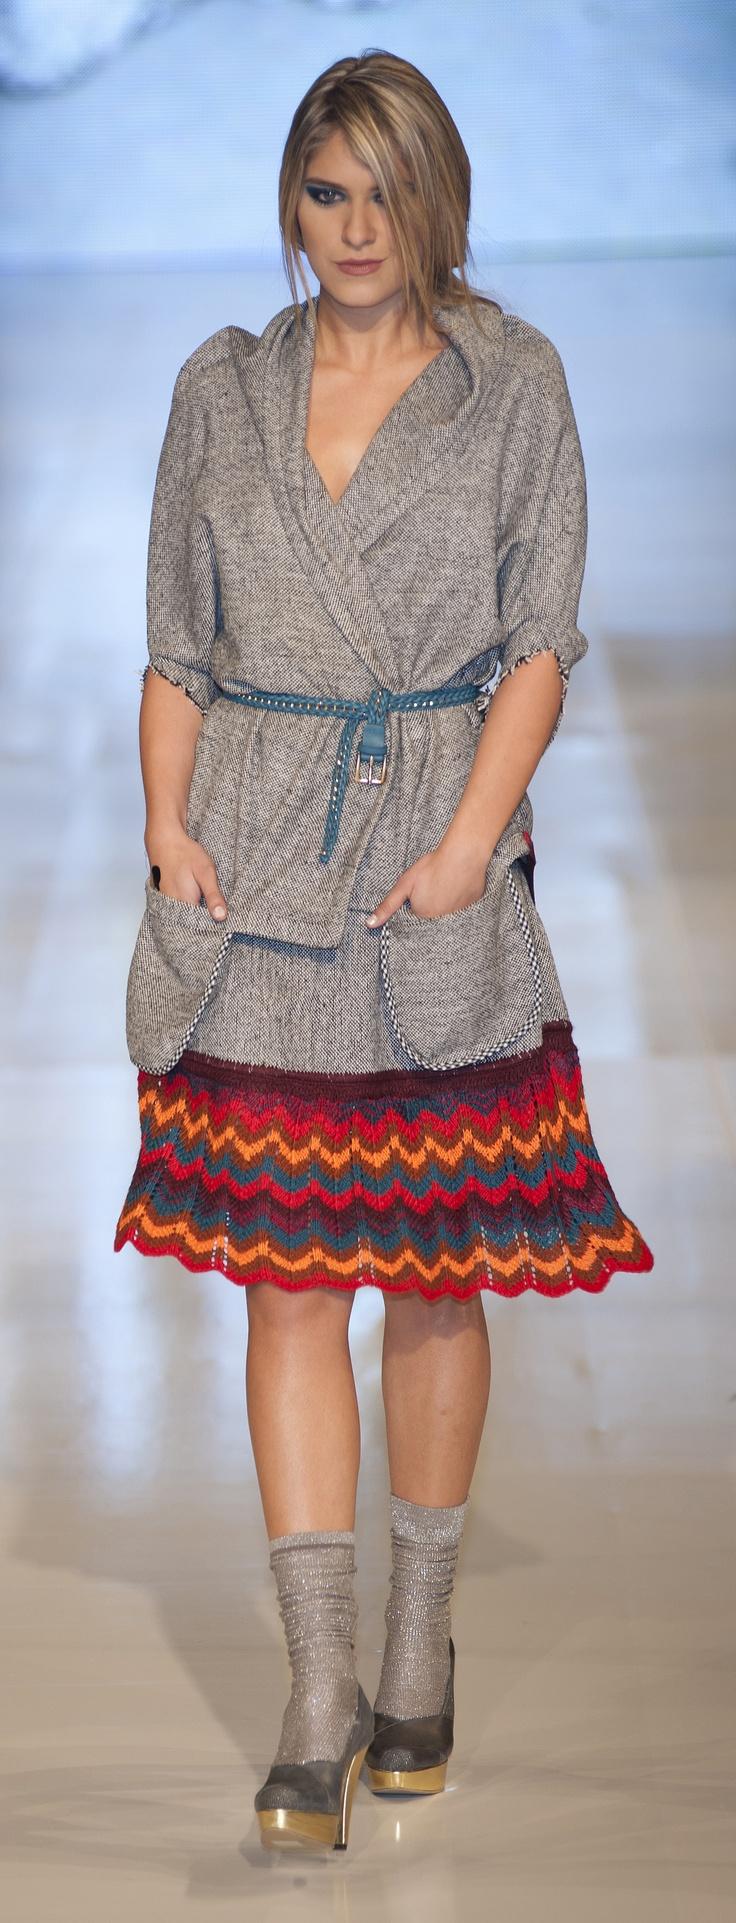 Horus Collection #Runway - #Designer: Adriana Santacruz #fashion #woman #moda @Ad_Santacruz